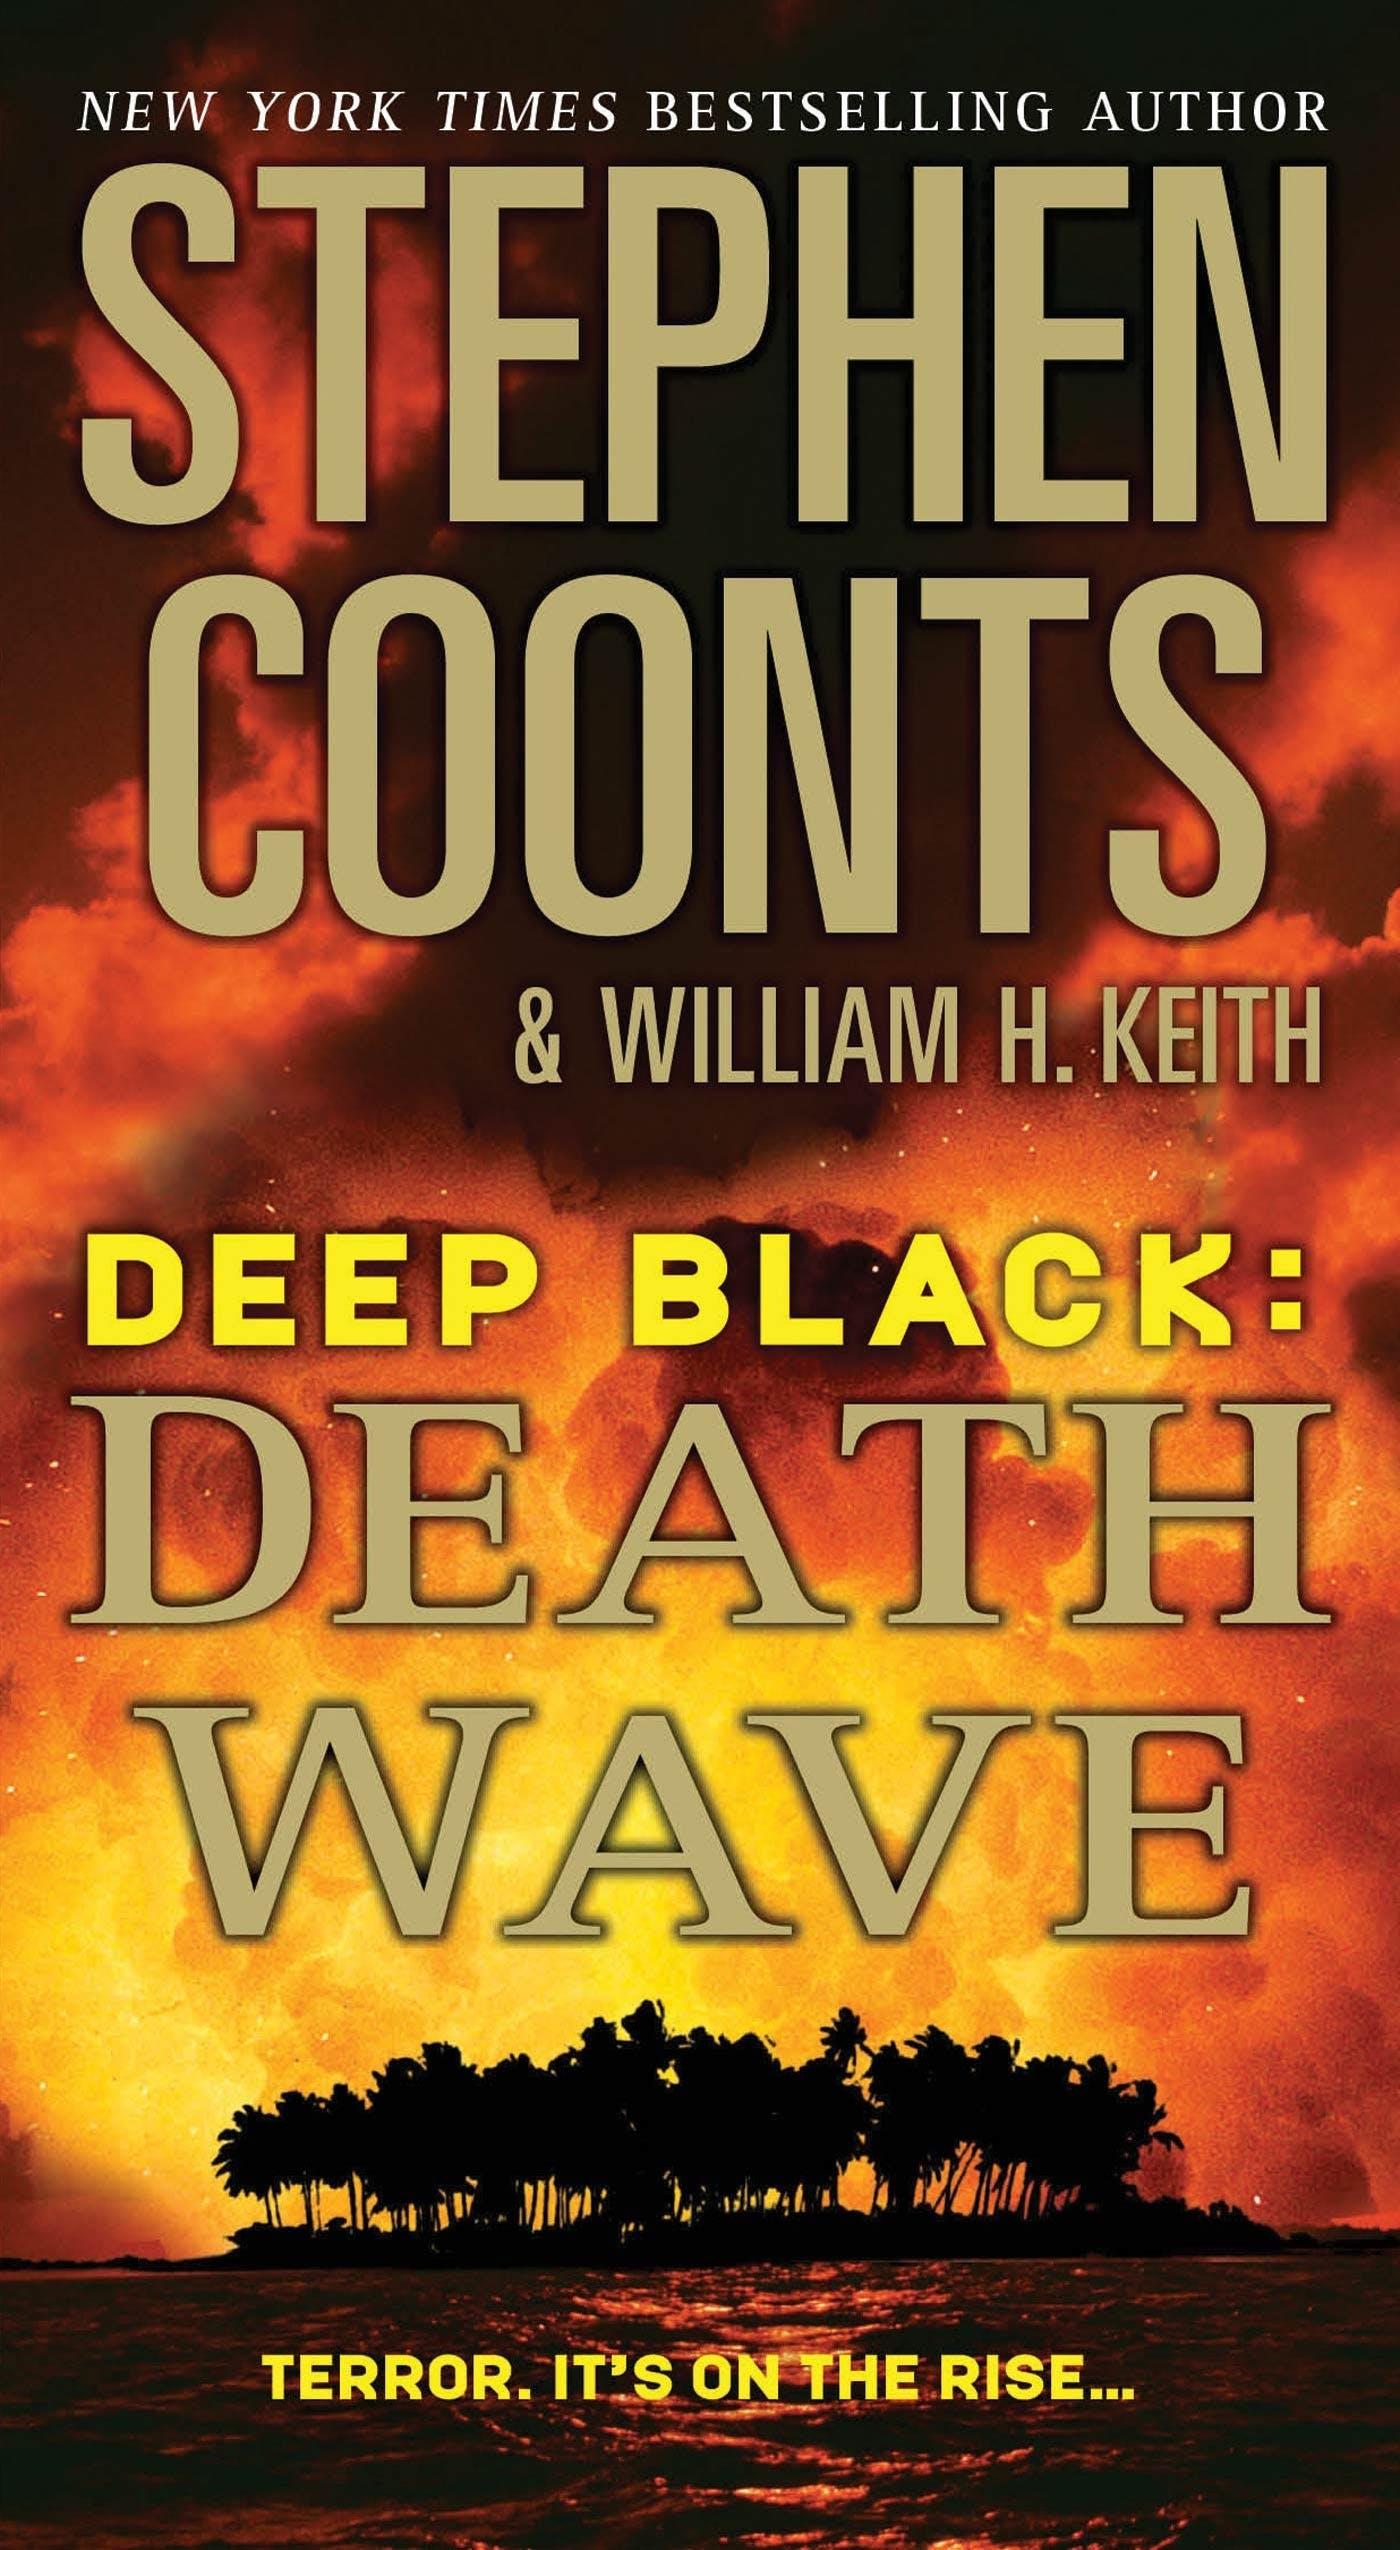 Image of Deep Black: Death Wave